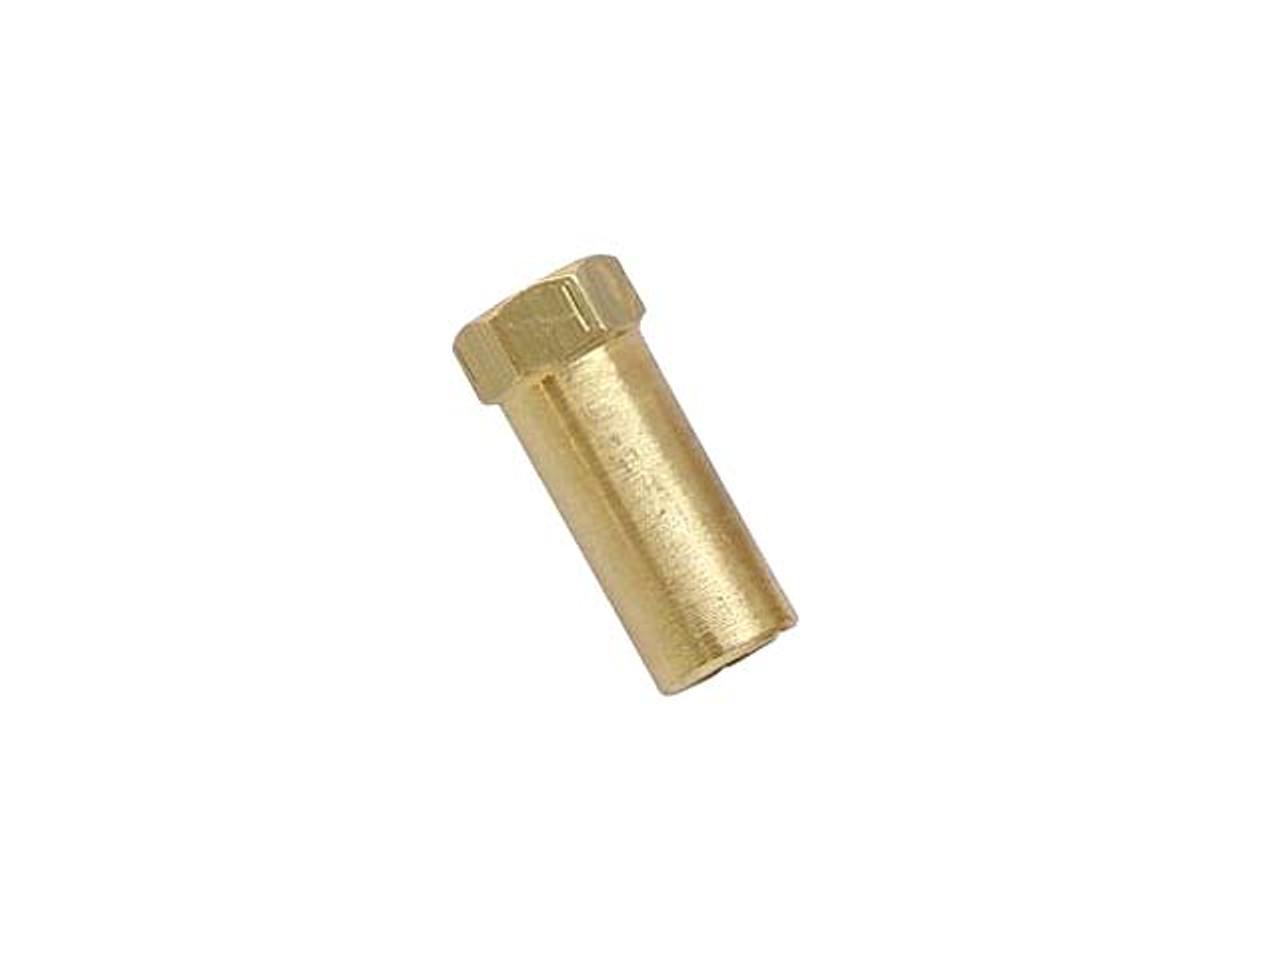 Extra Tall Brass  Exhaust Nut M6 x 25mm  (SOLD EACH)